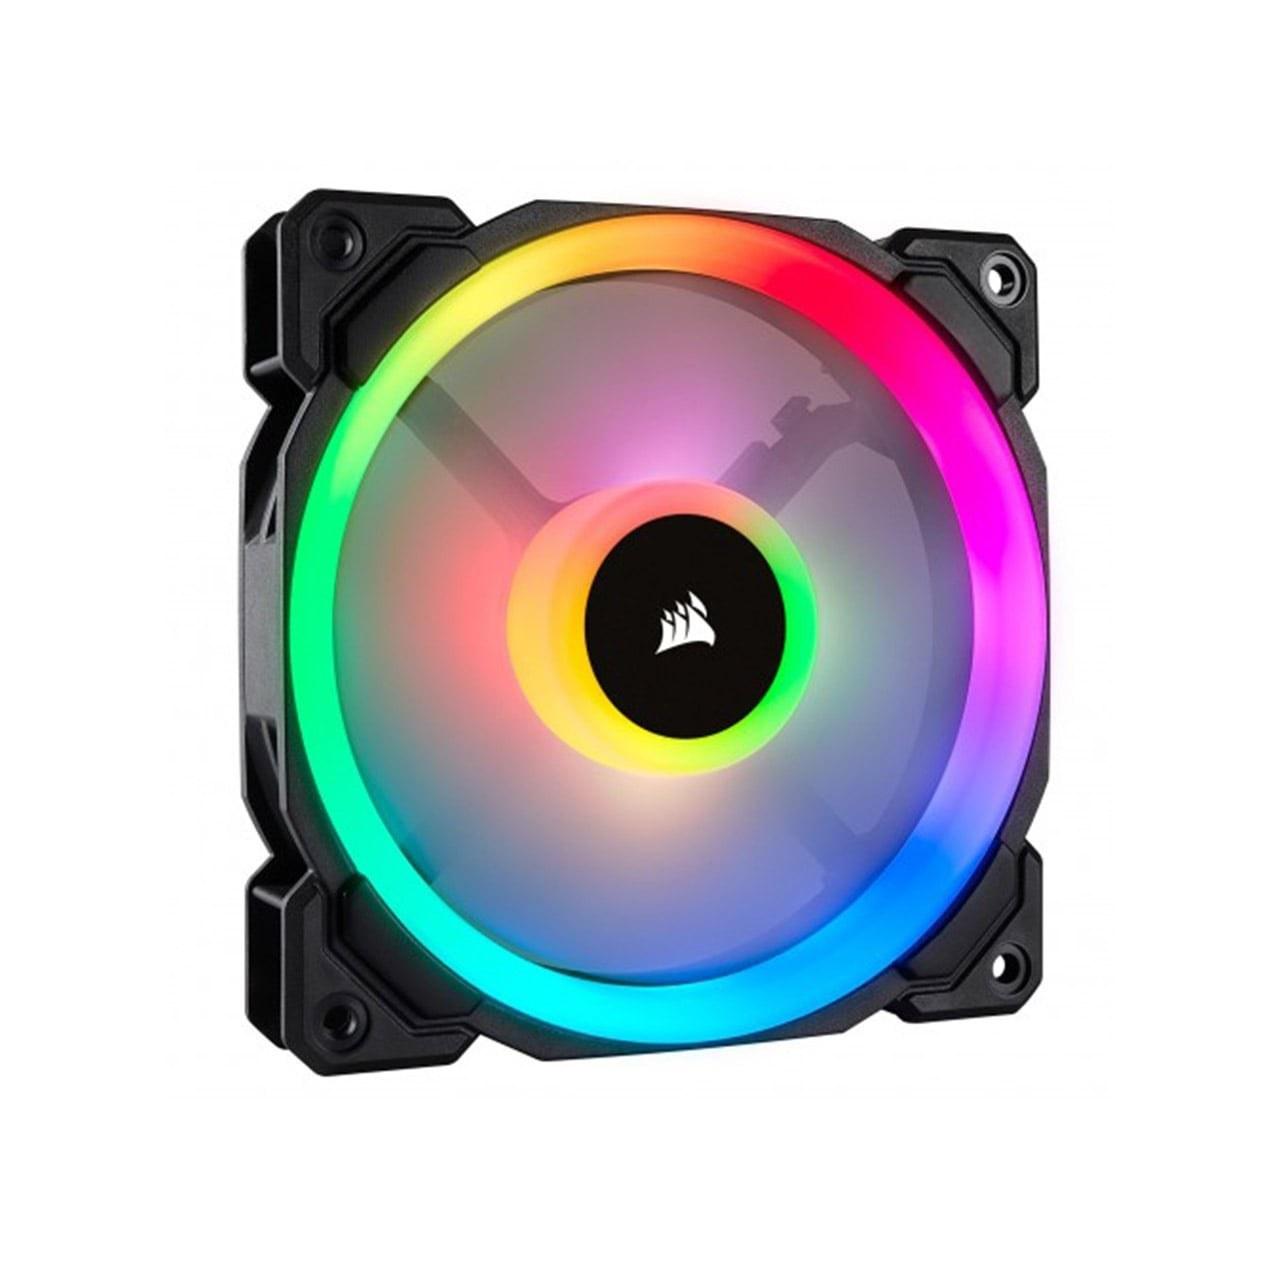 تصویر فن کیس Corsair مدل iCUE QL120 RGB Triple Fan